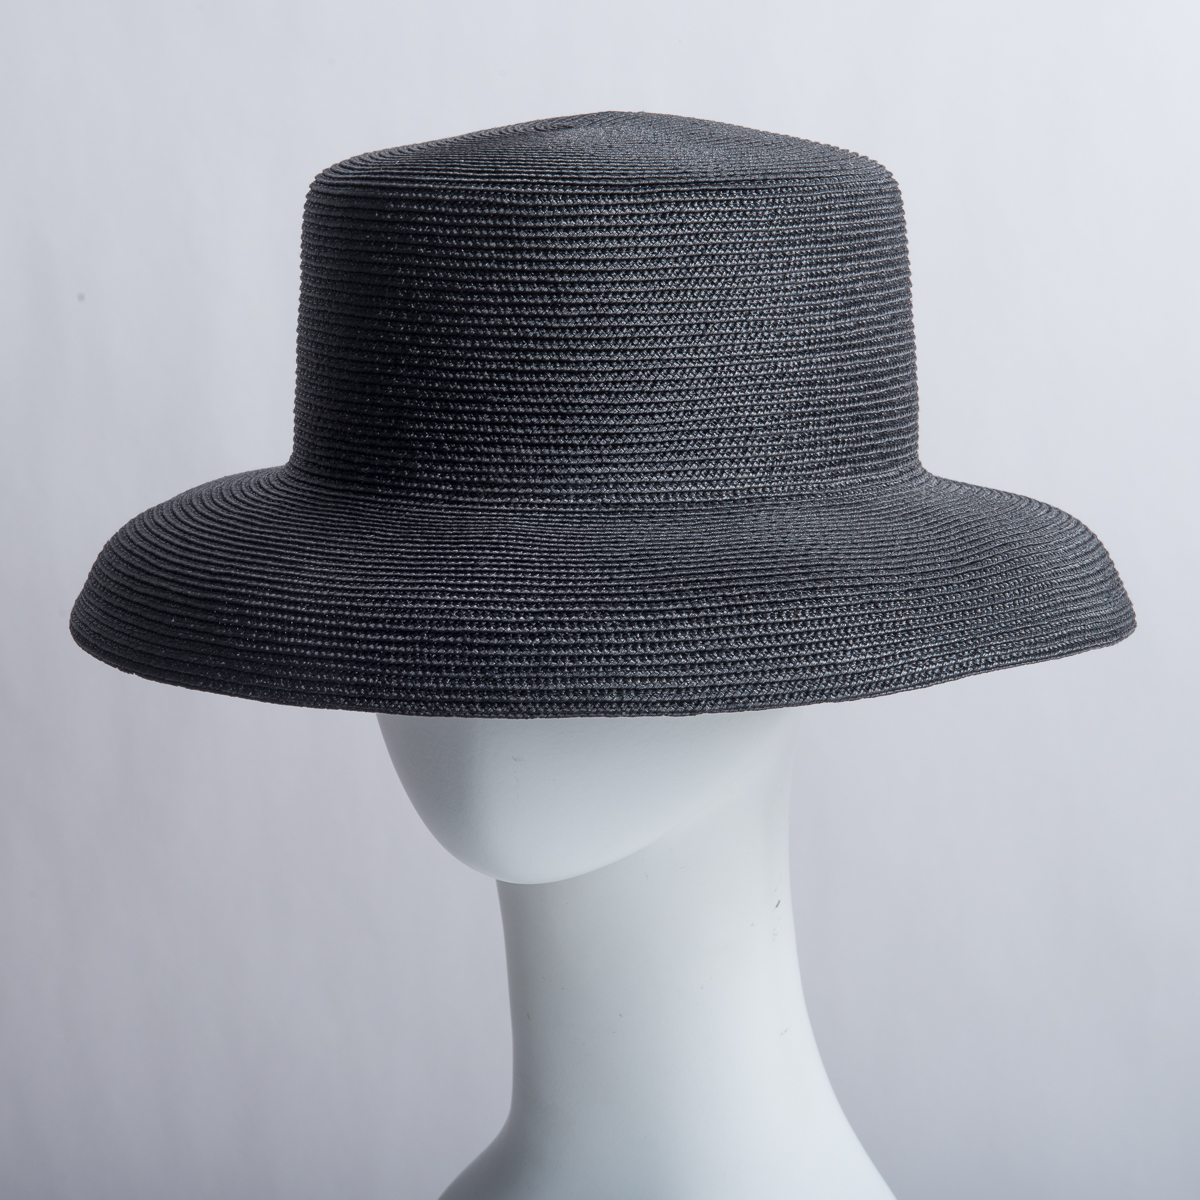 bd1dc7cd9ab282 Dull Polypropylene Straw Medium Brim Plain Hats-Y6014_88- Sun Yorkos | Zoria